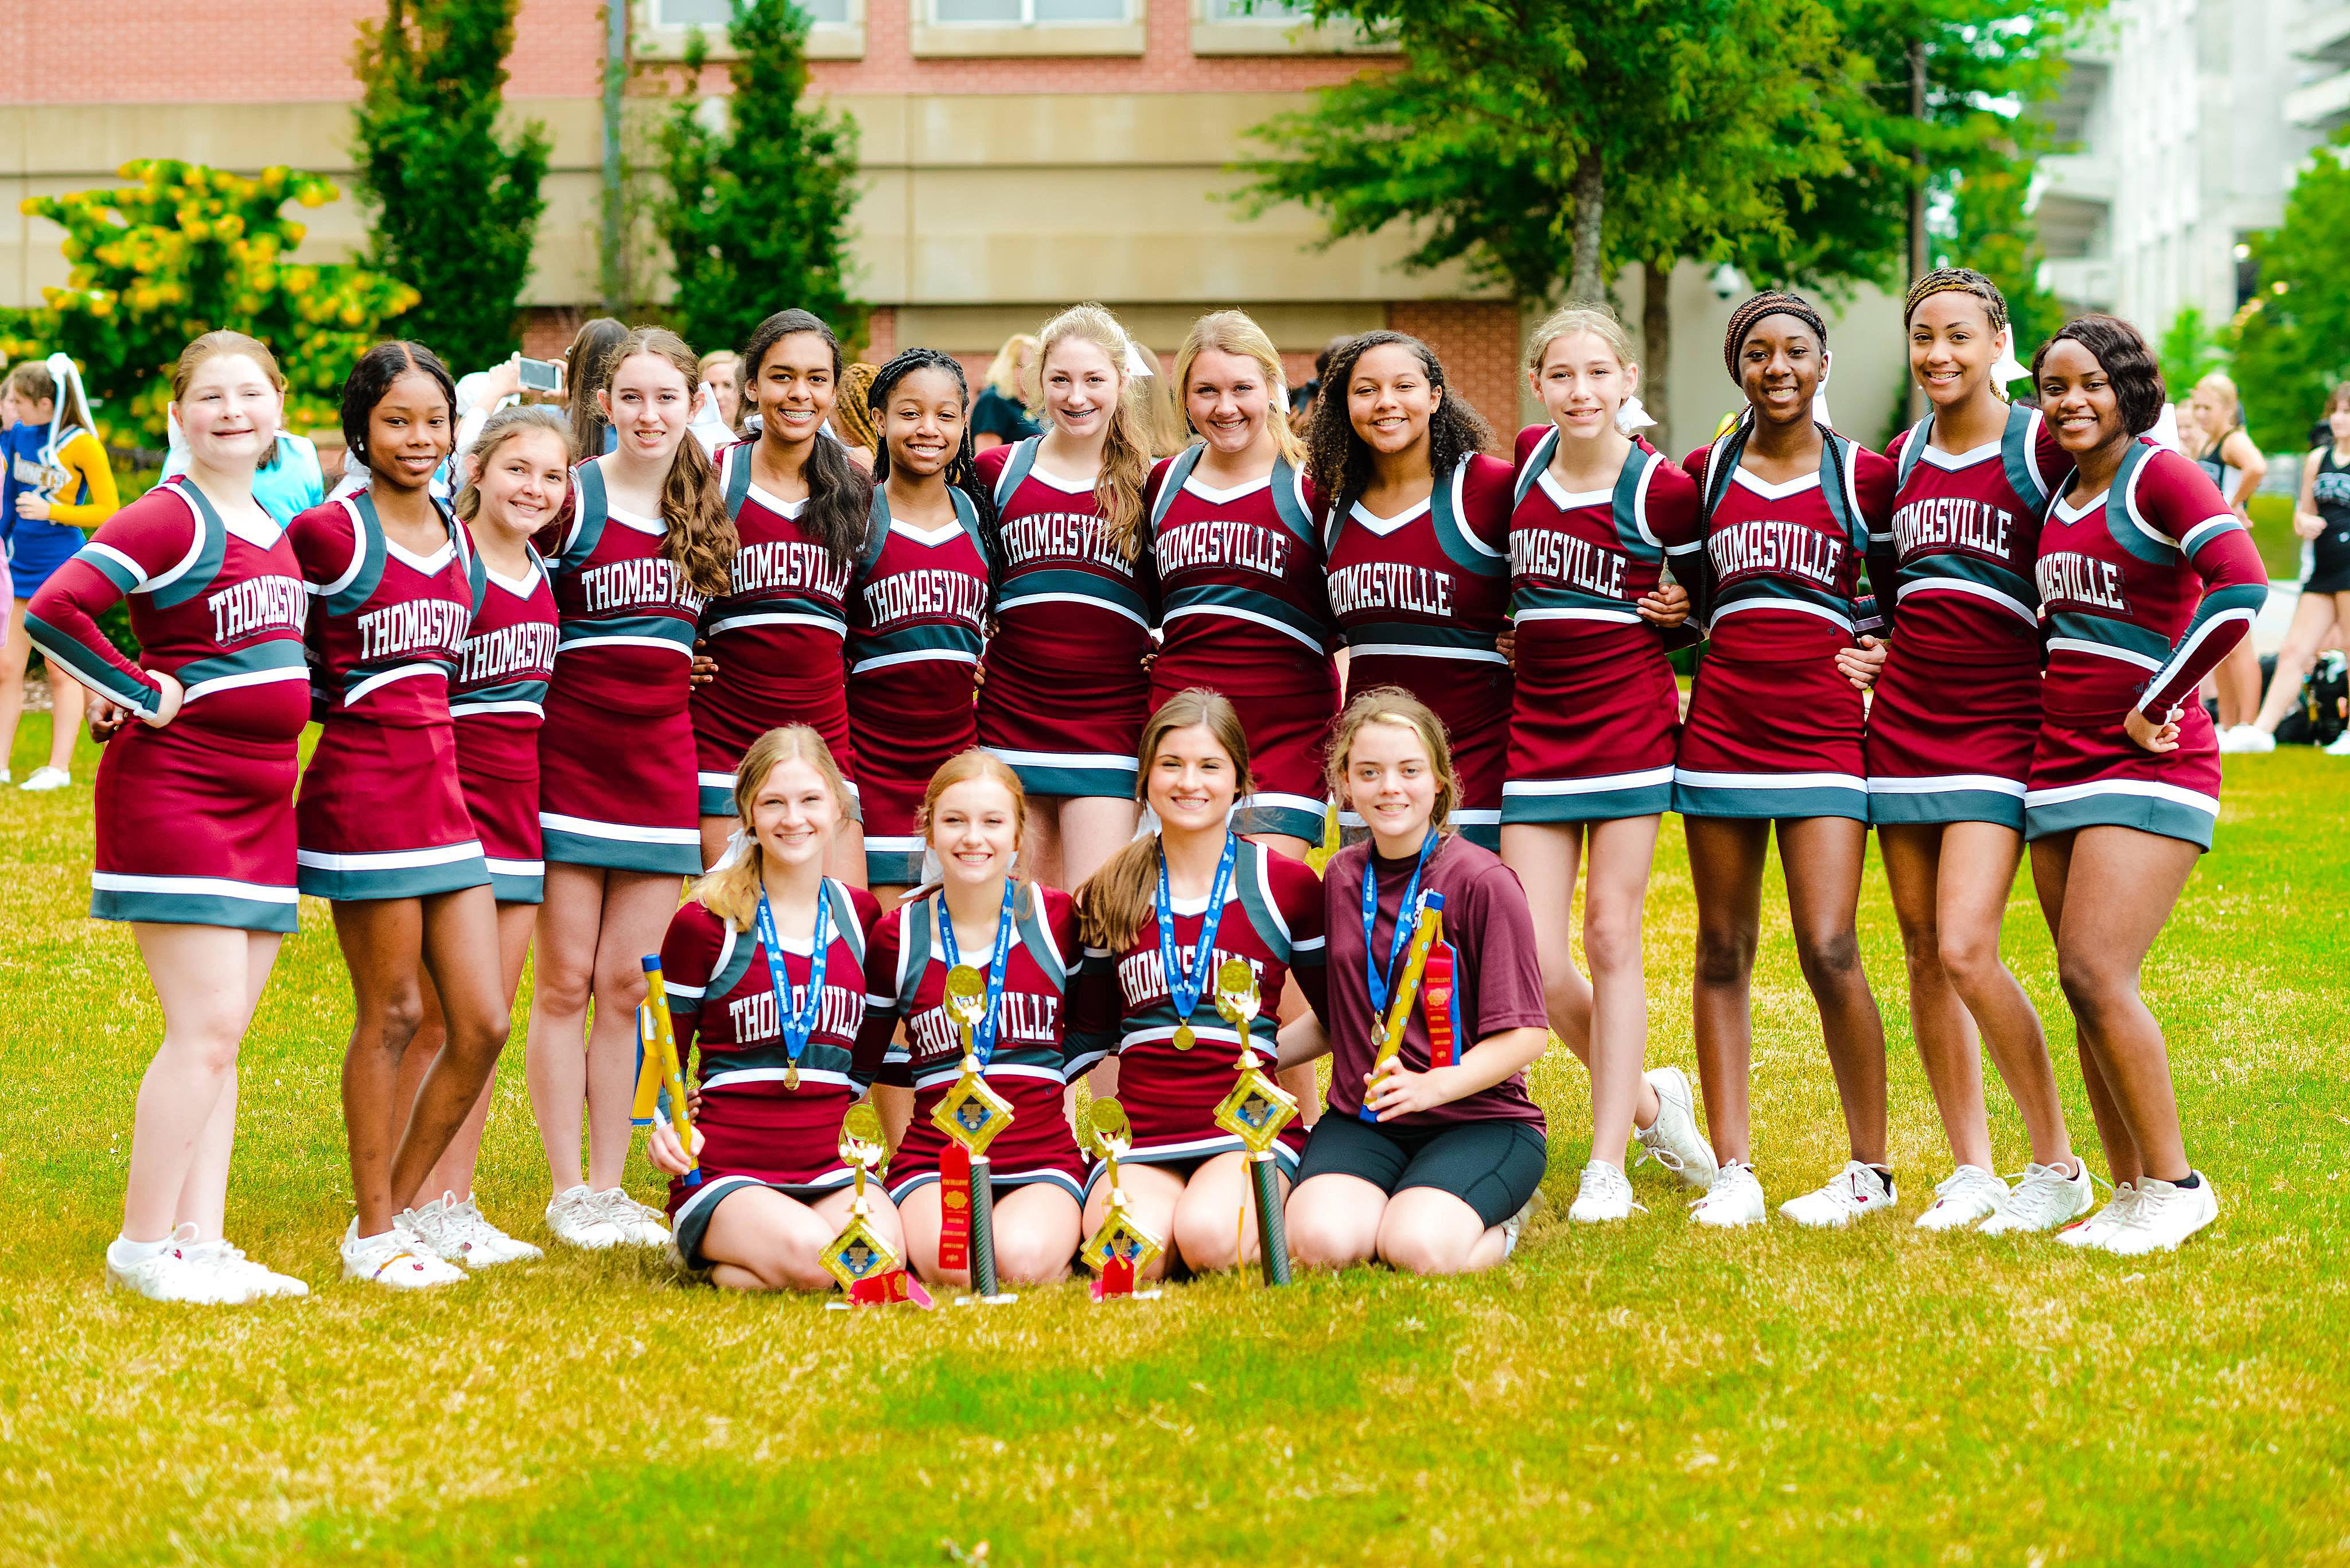 THS Cheerleaders at Cheer Camp